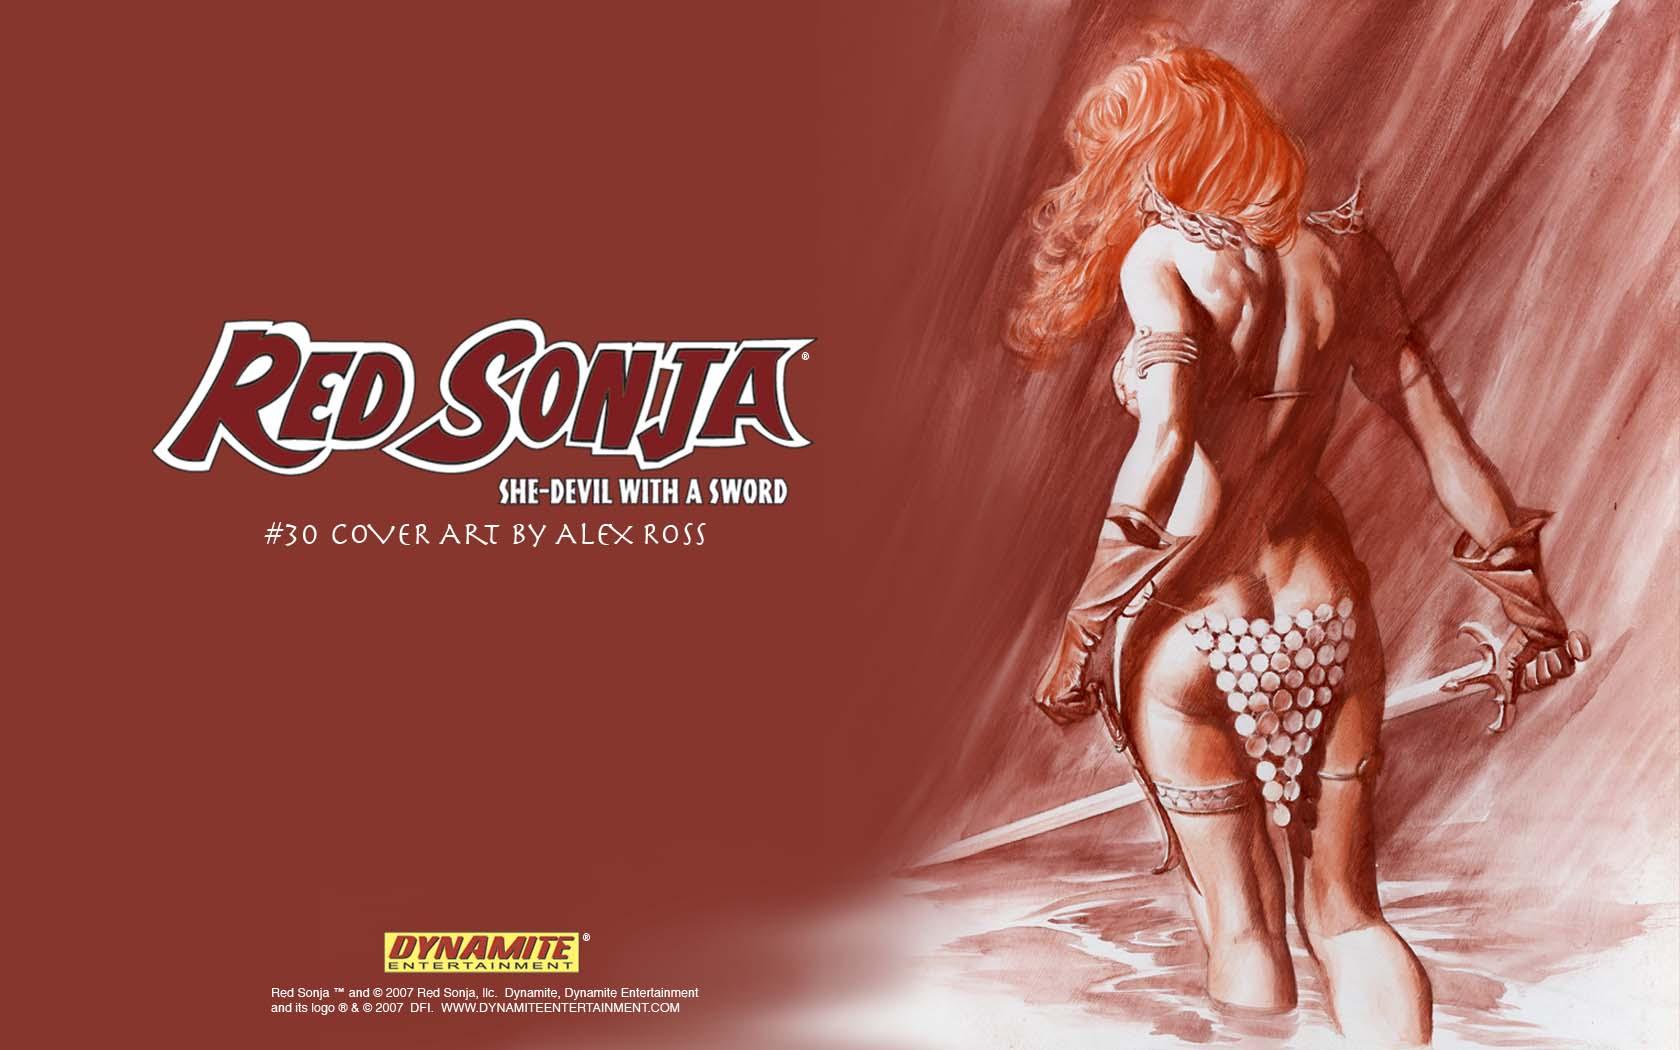 Red-Sonja-Alex-Ross_955